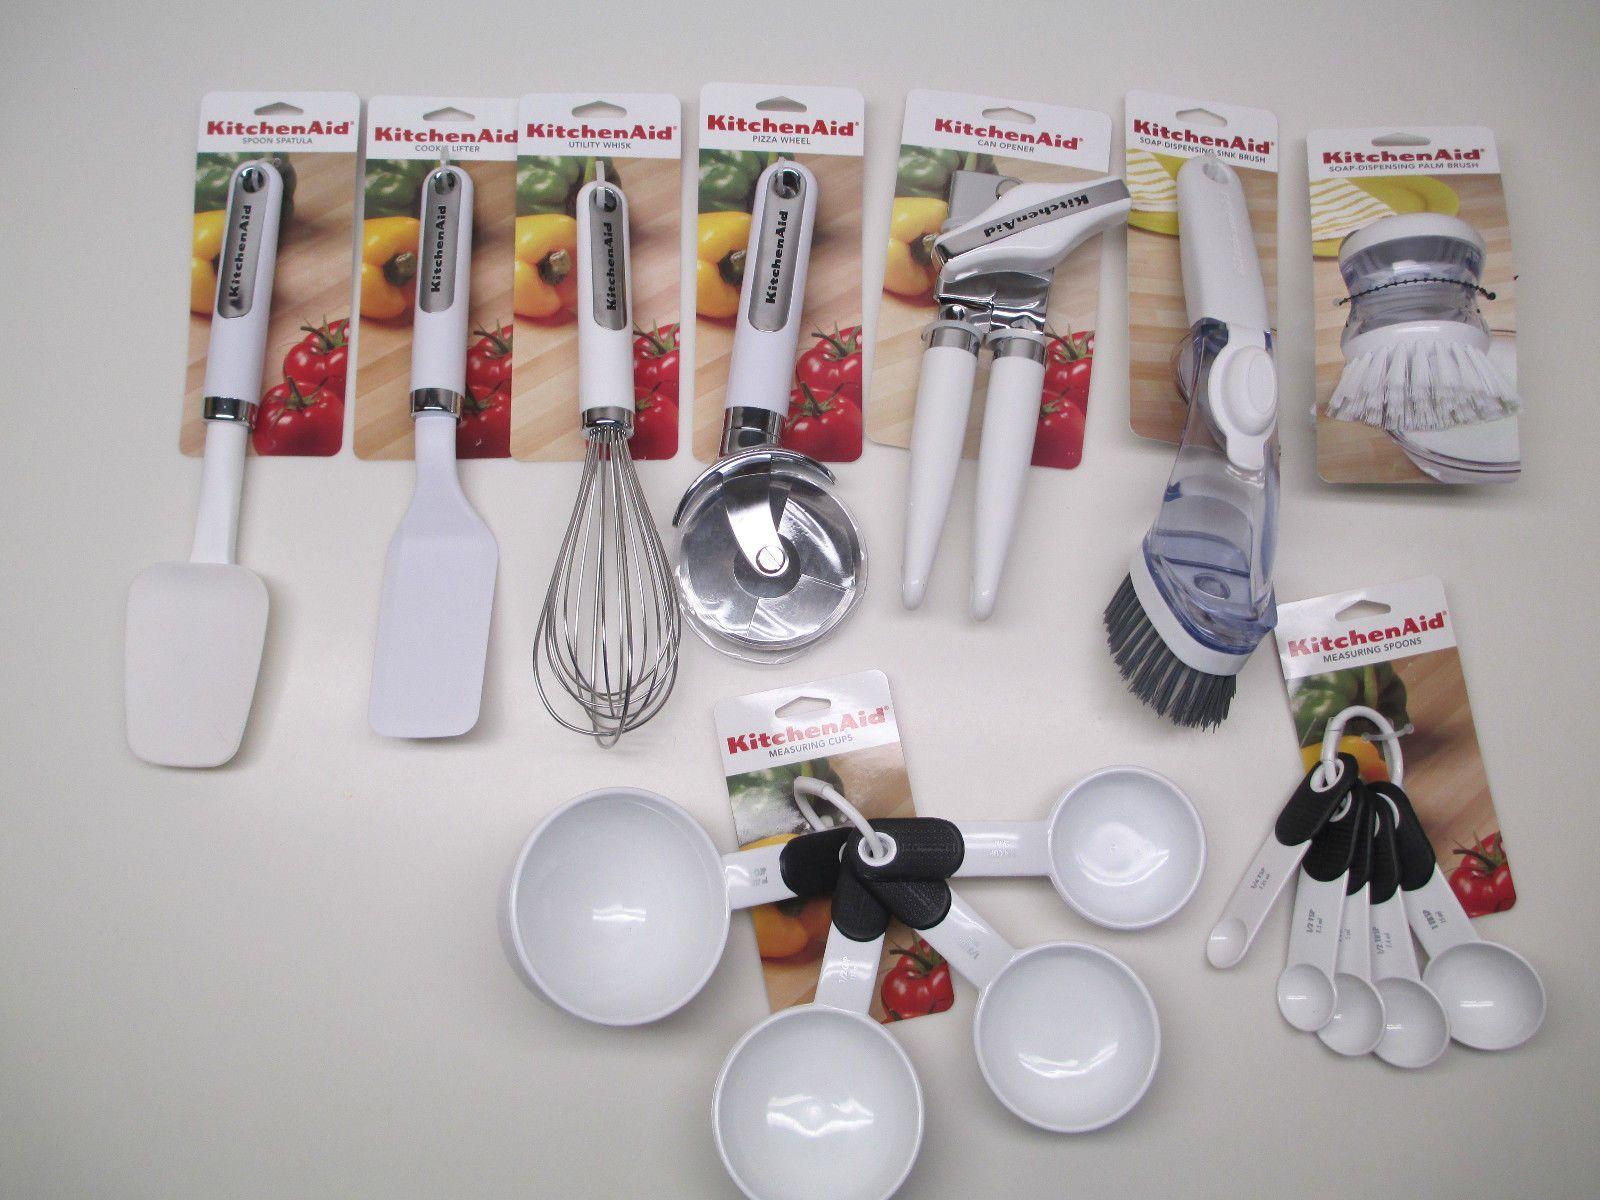 Cooking Utensils 20649 Kitchenaid White Kitchen Utensils